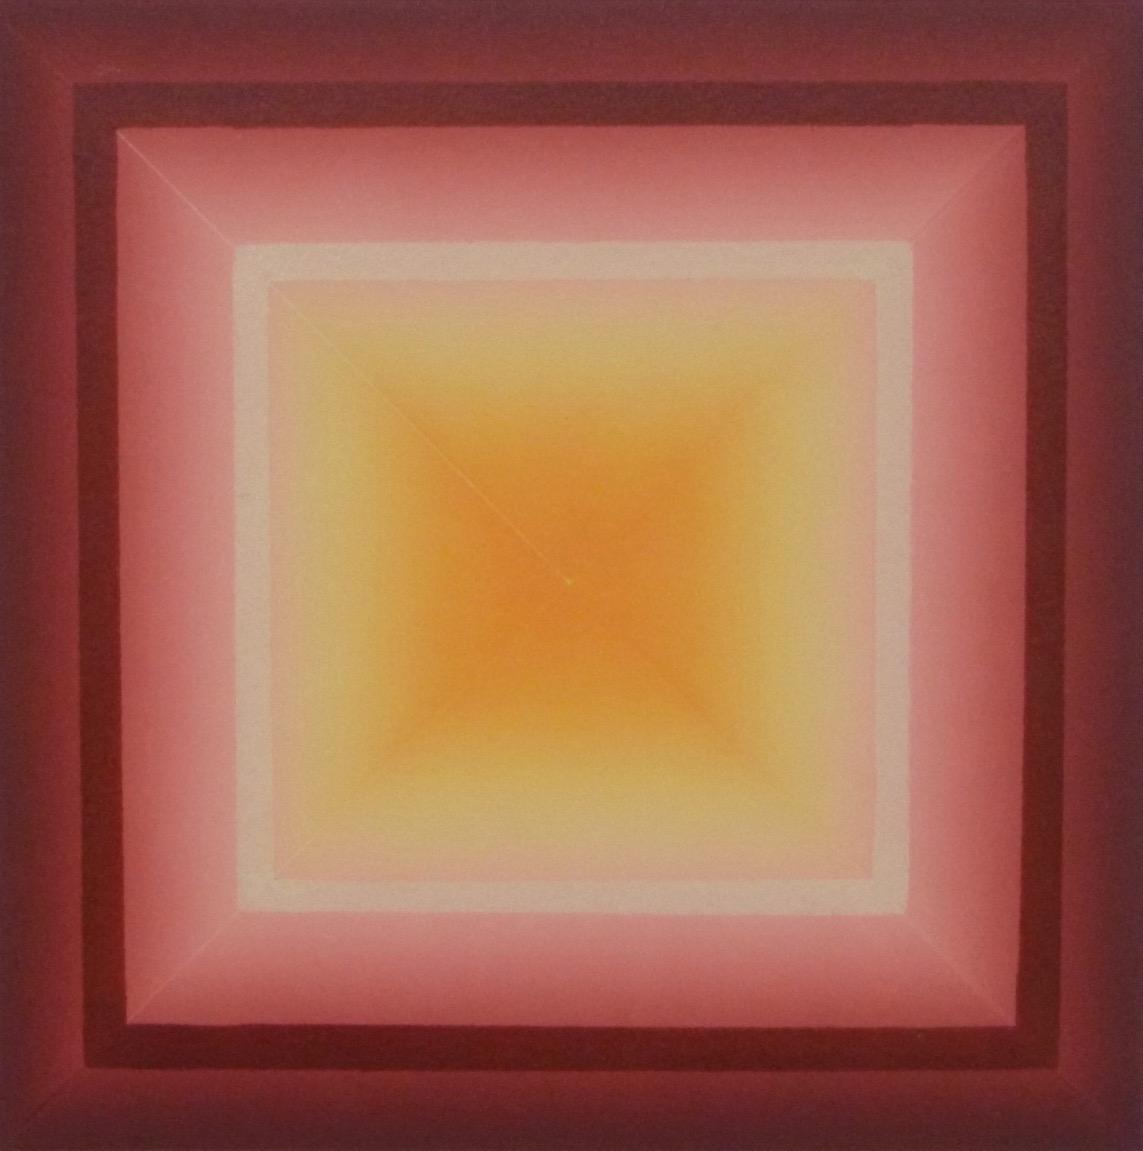 Burning Box  by Lorna Livey